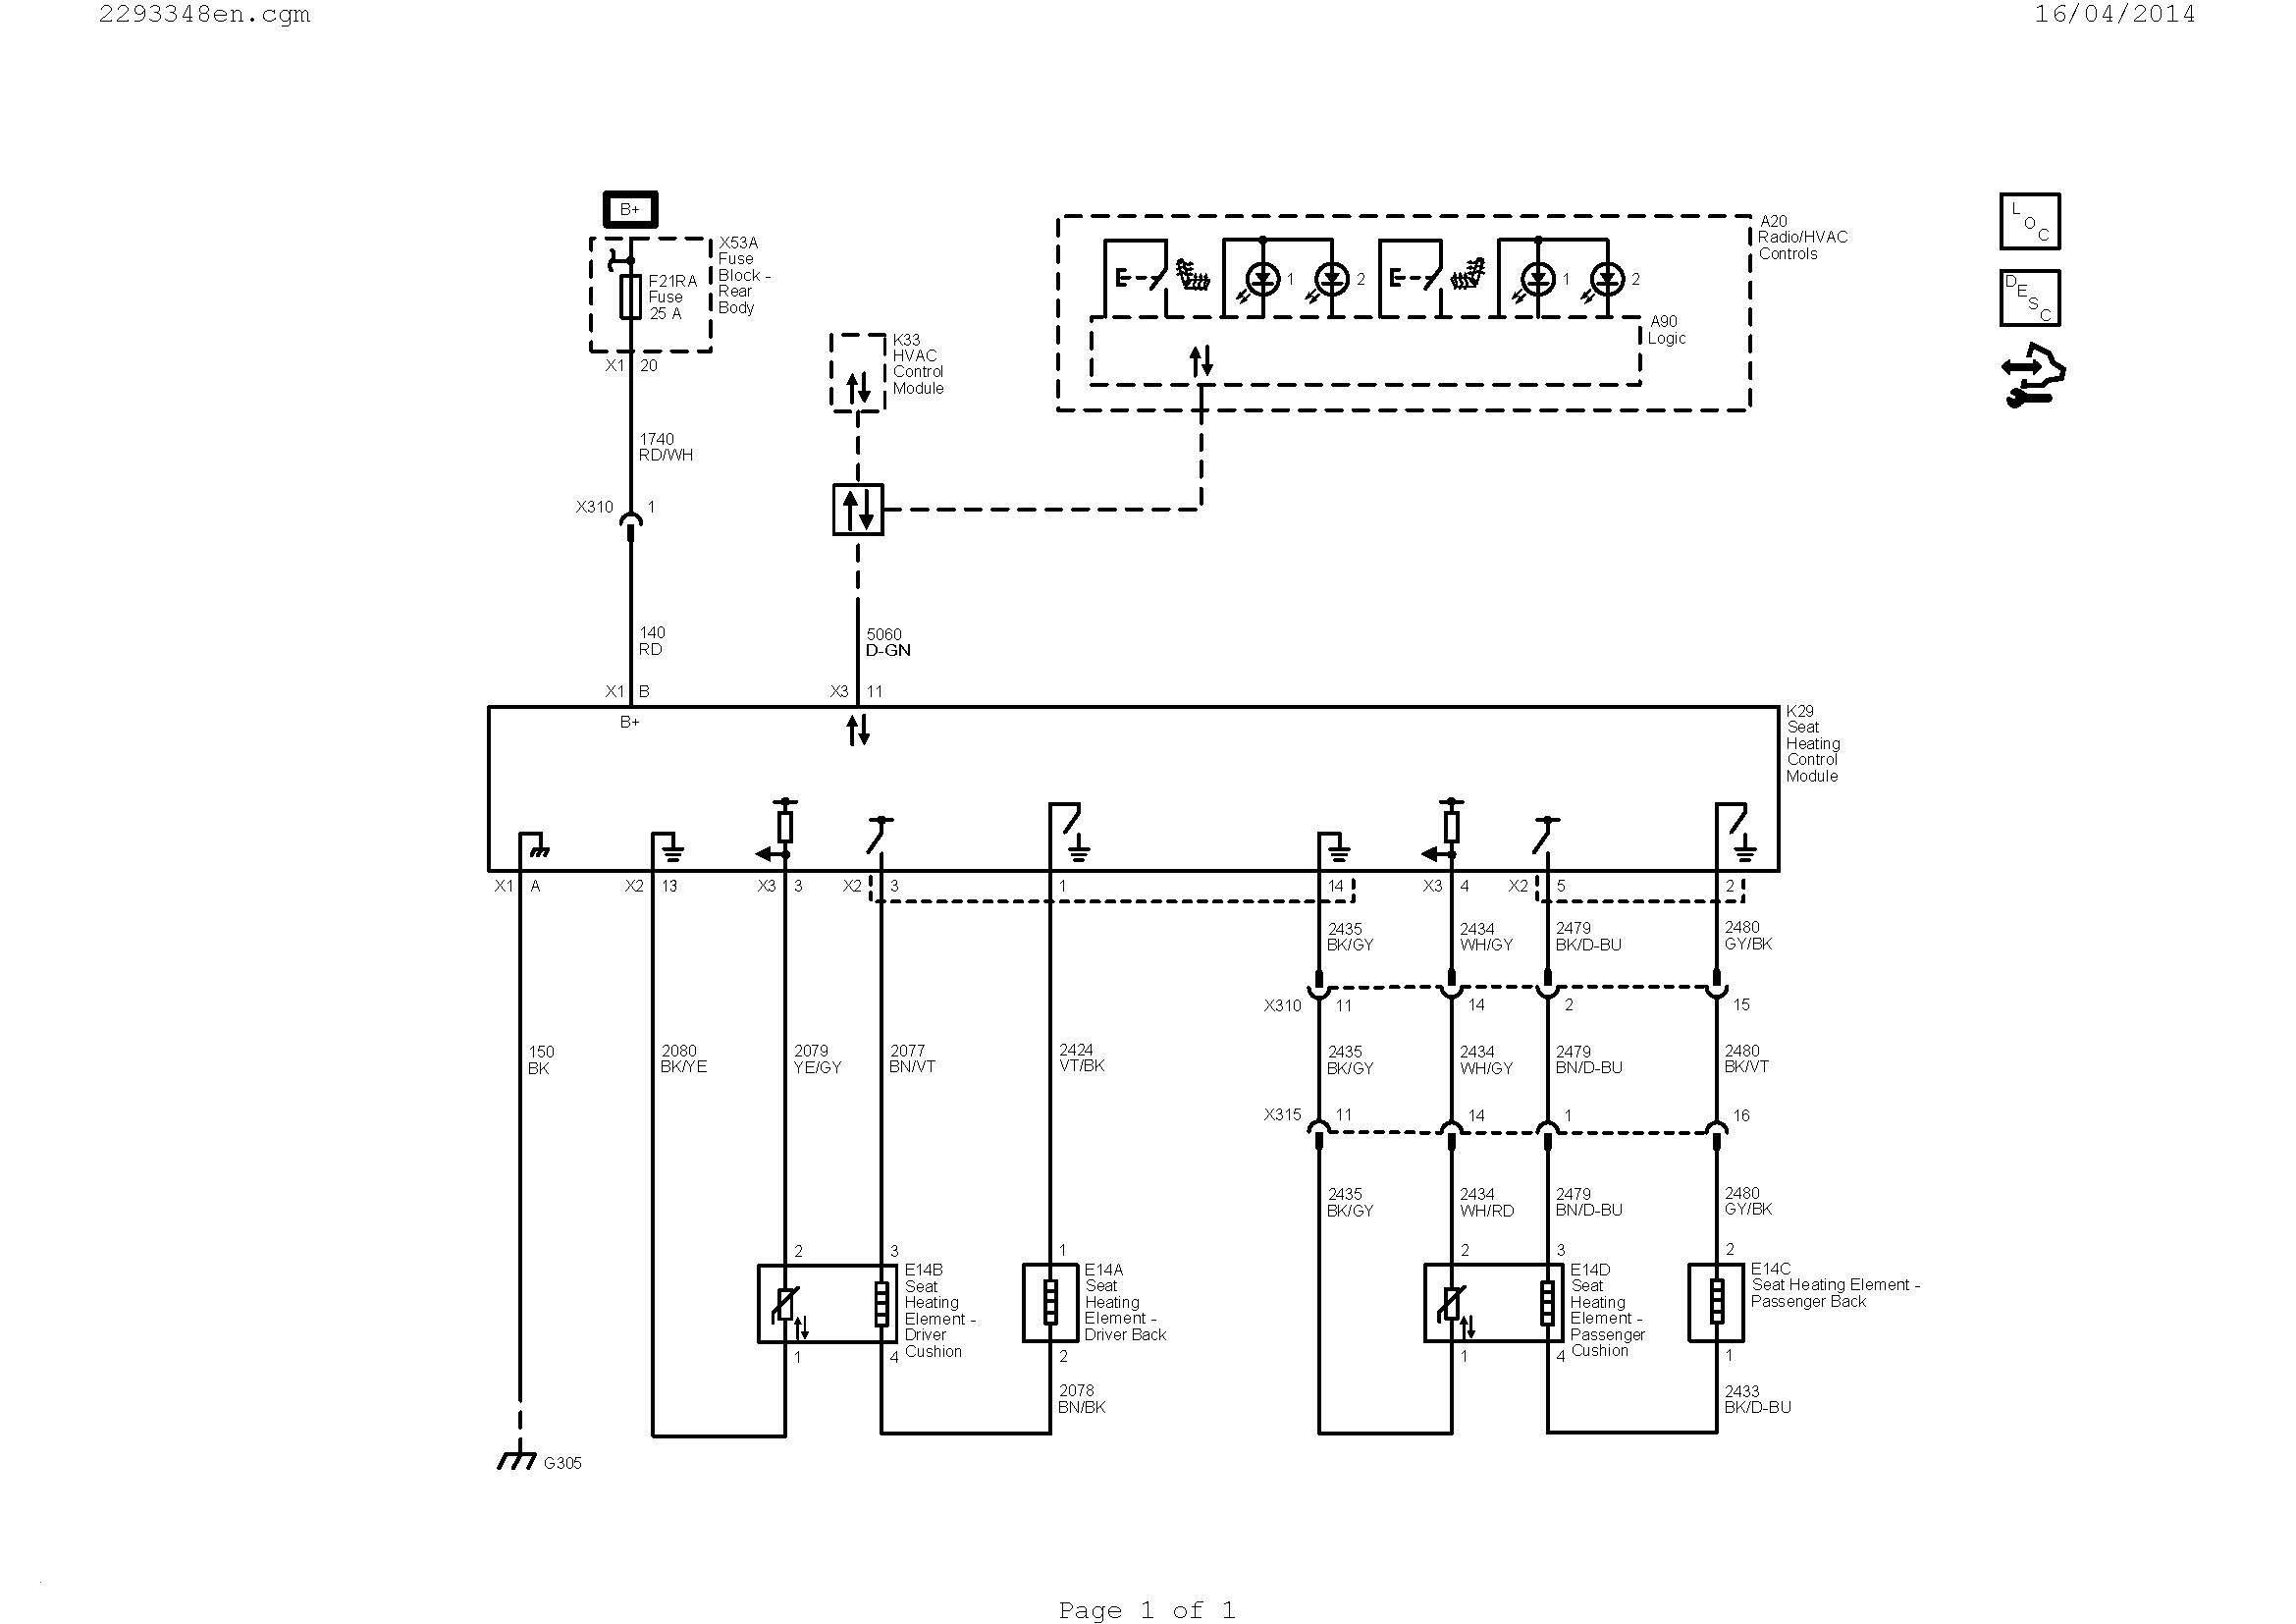 Understanding Car Wiring Diagrams Automotive Wiring Diagrams Schaferforcongressfo Of Understanding Car Wiring Diagrams